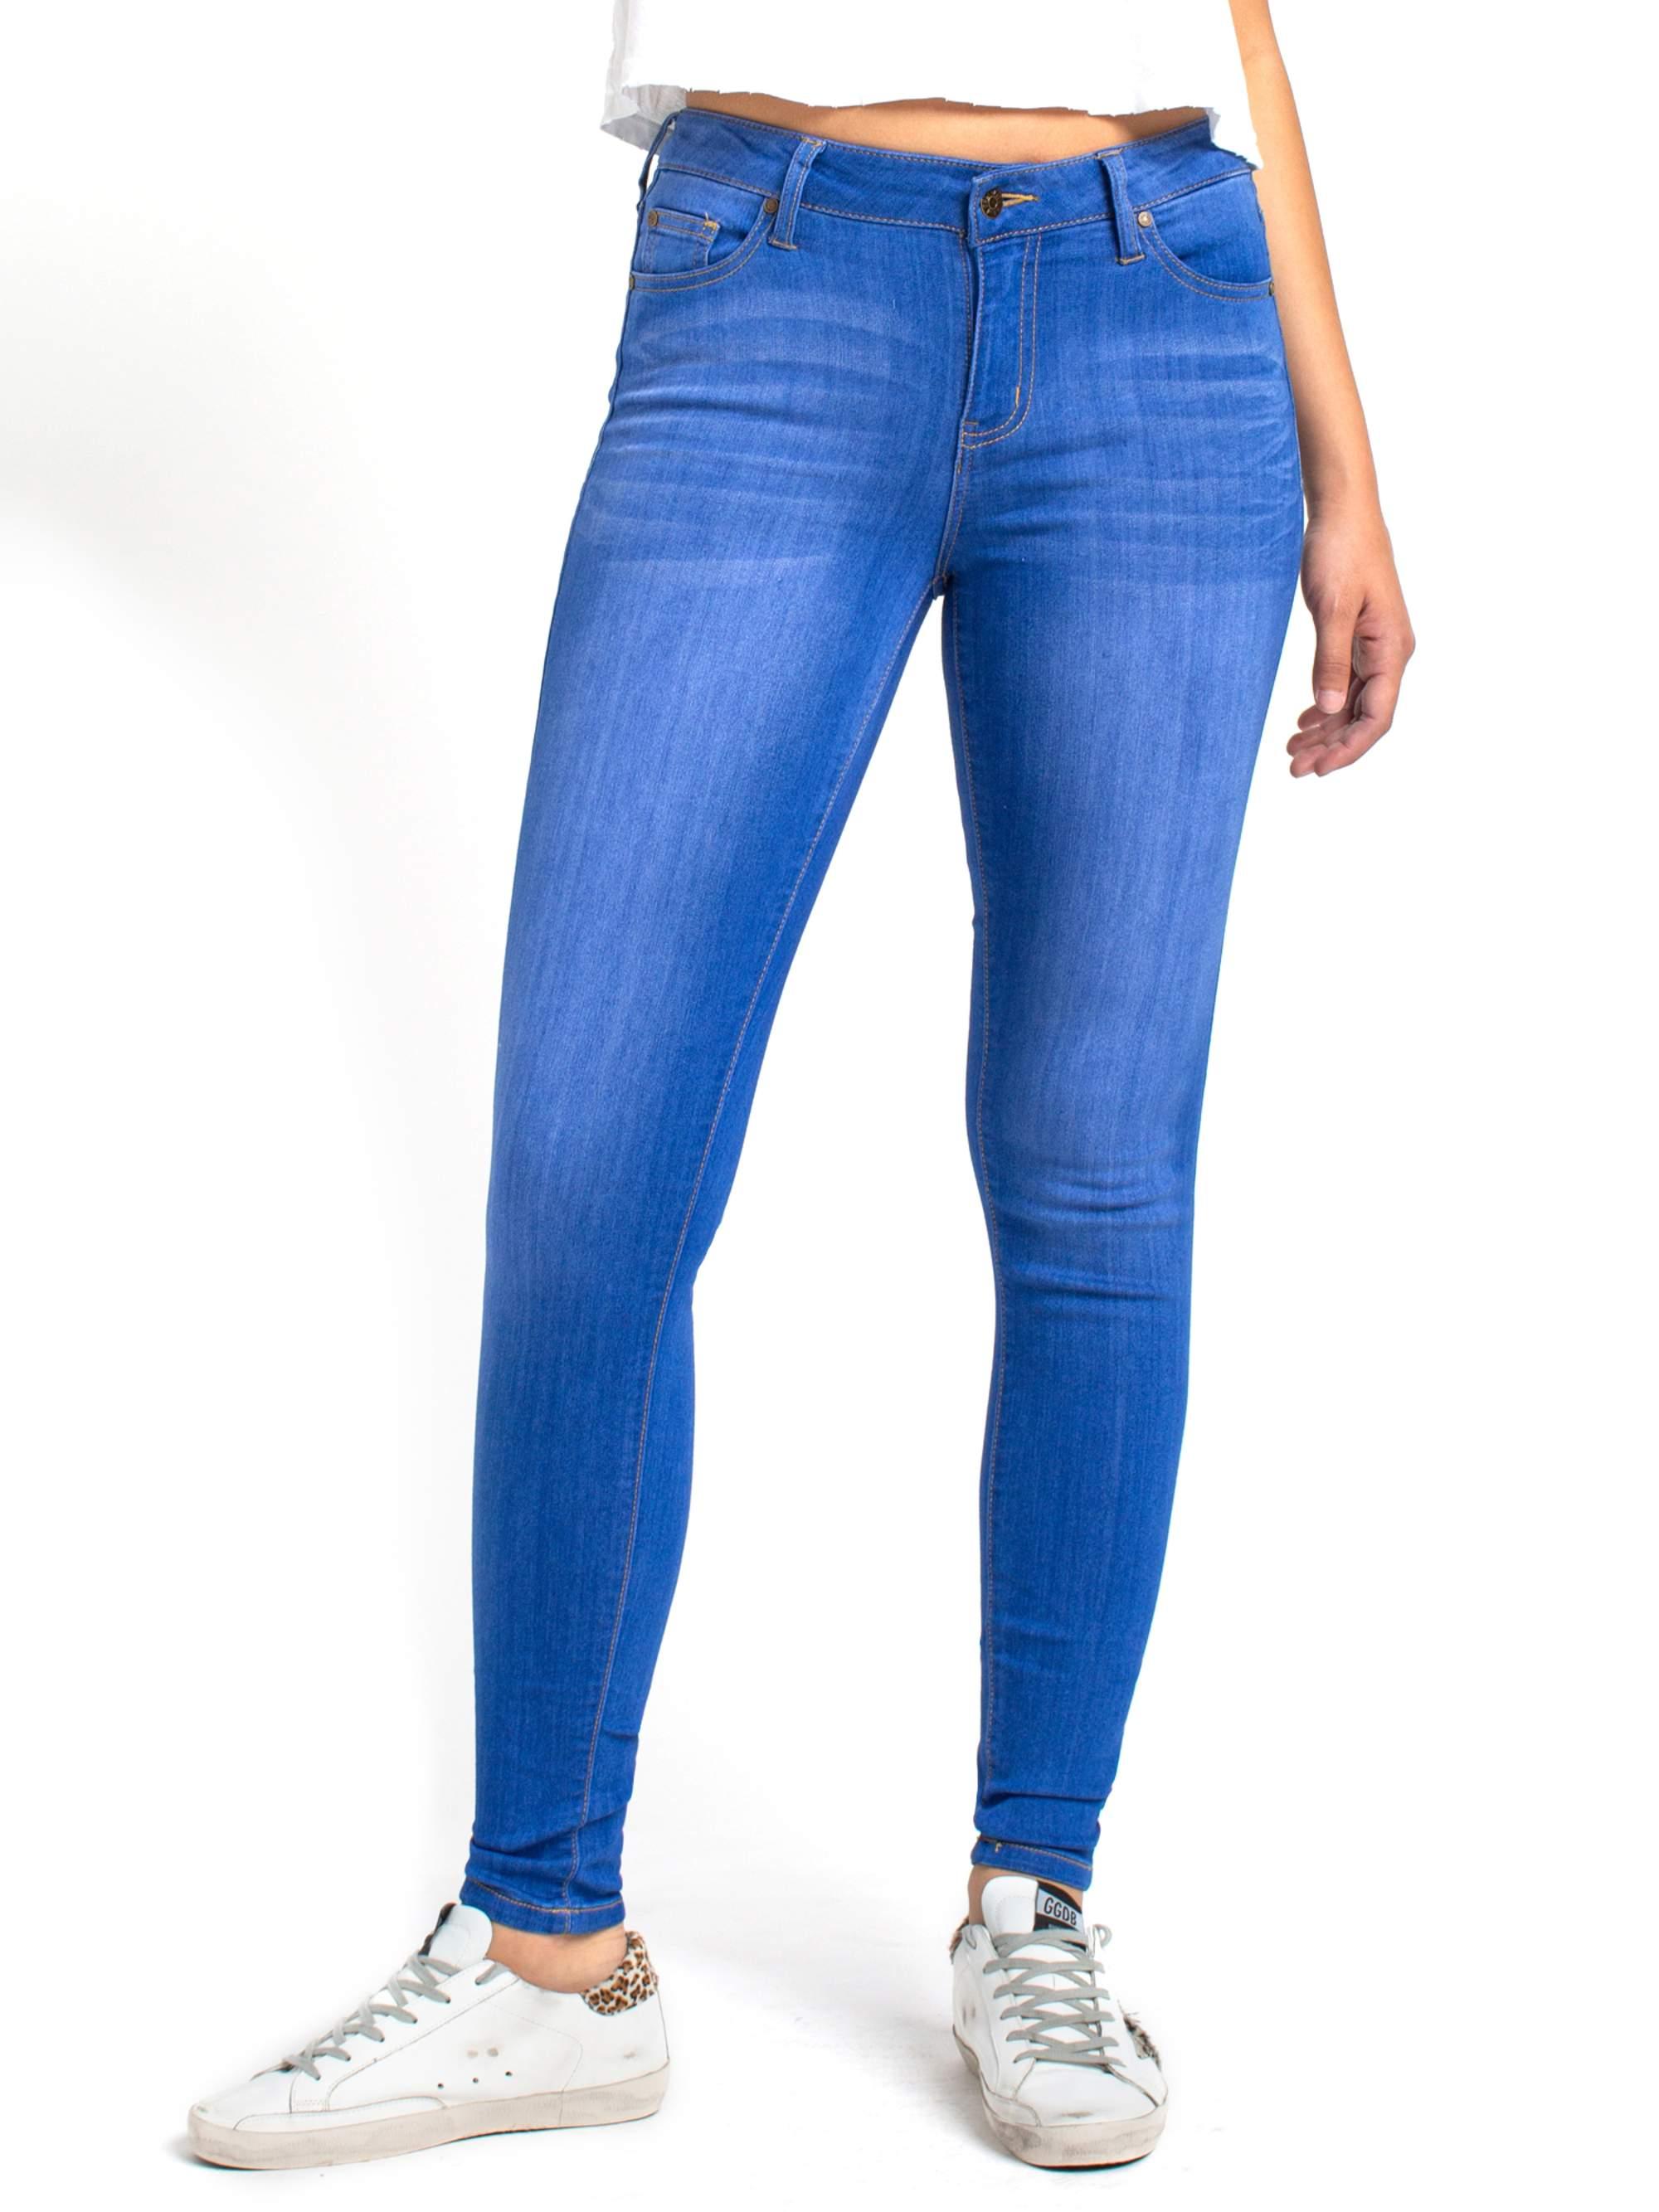 Celebrity Pink Juniors The Slimmer High-Waist Jeans